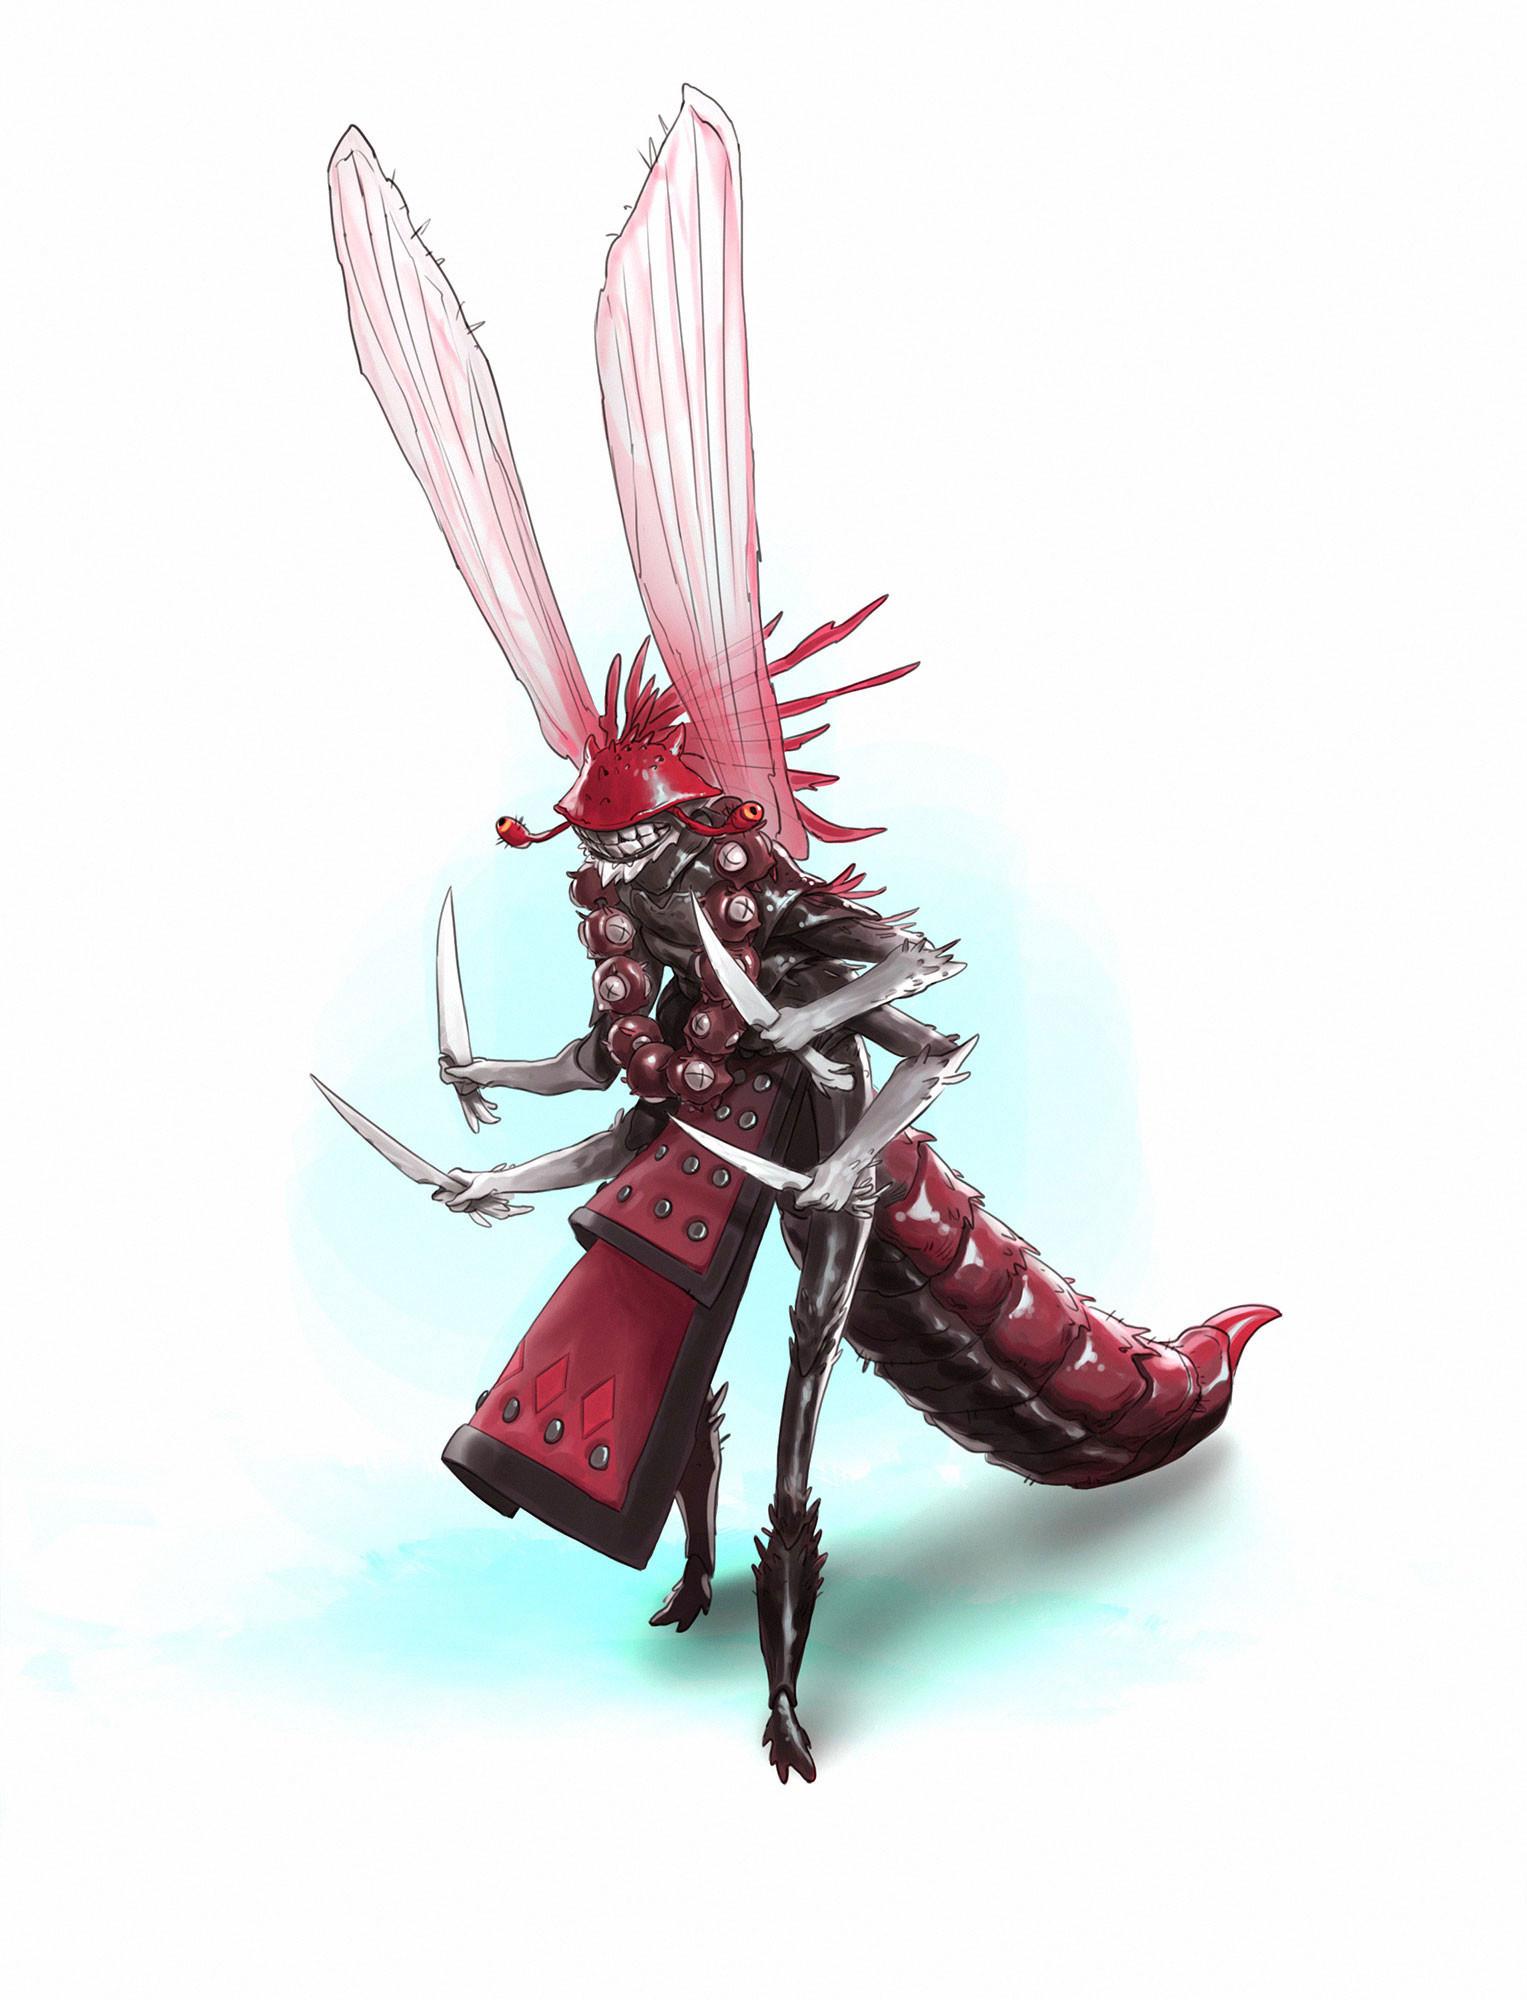 Marion kivits 20180825 cdchallenge insect2